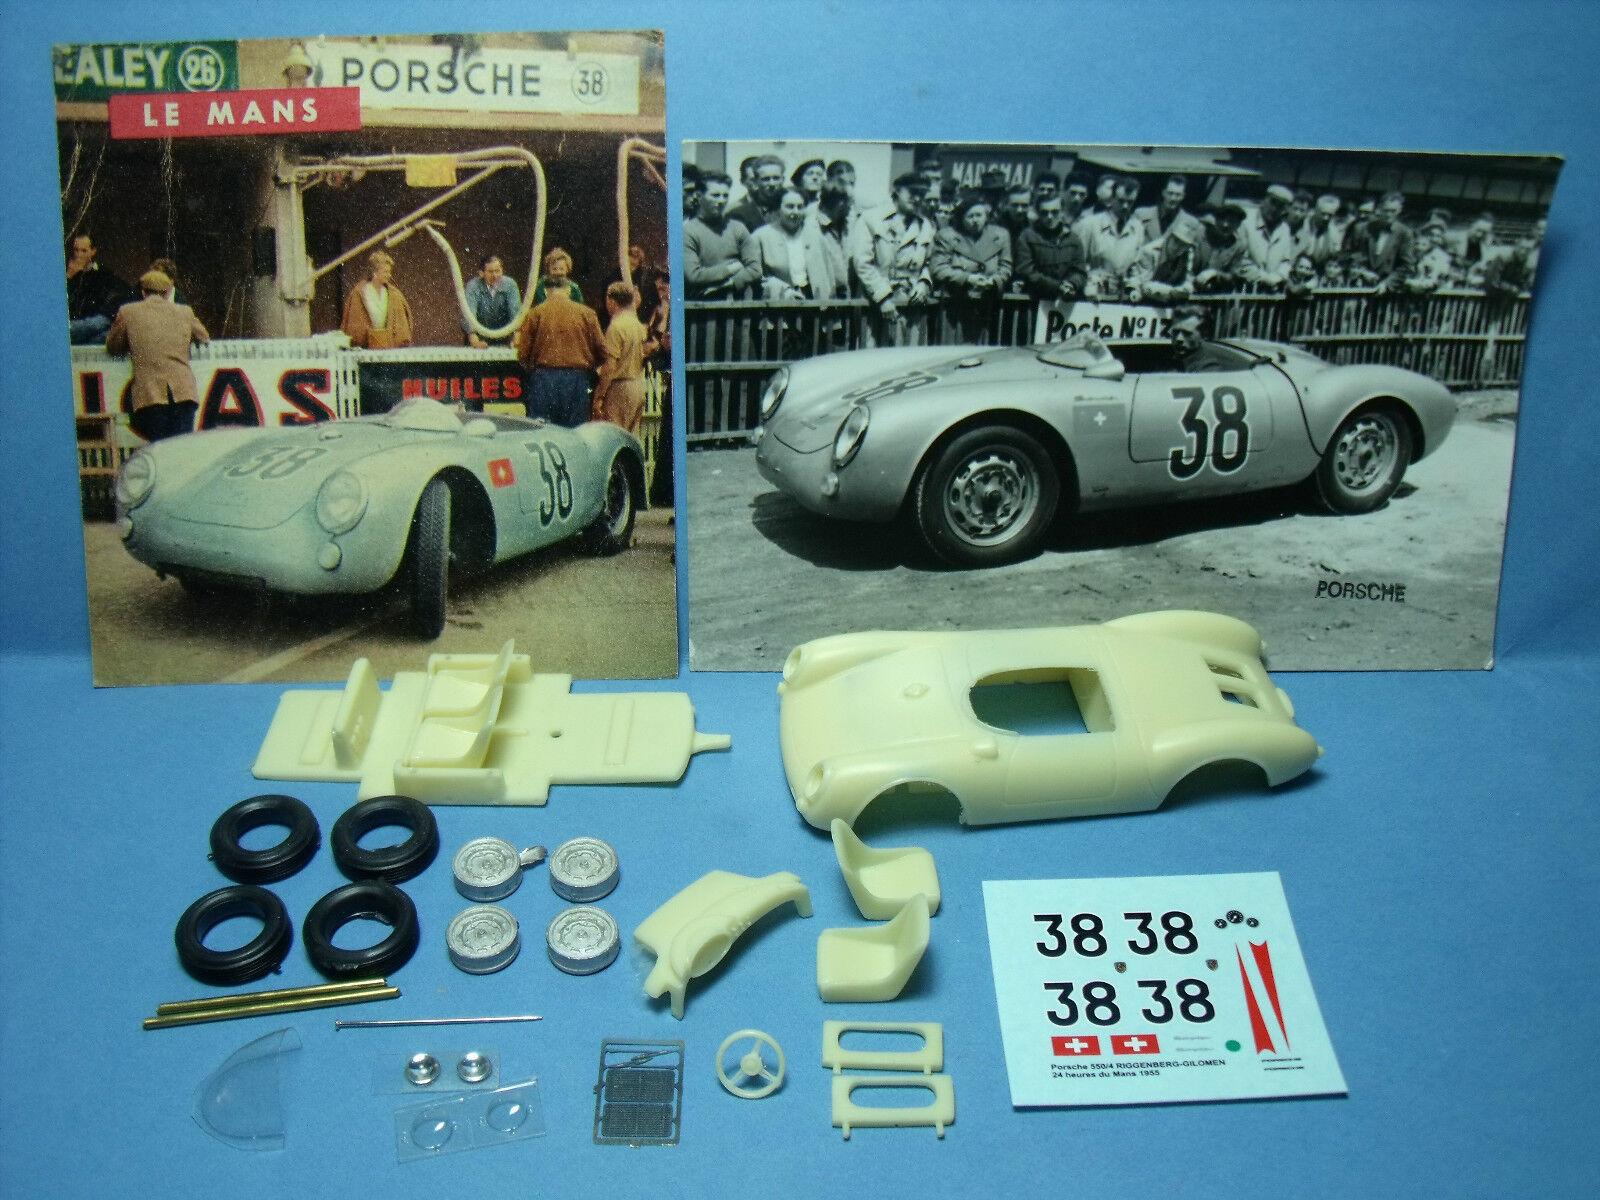 Porsche 550 spyder le mans 1955 numero 38 vroom kit 1 43 no spark